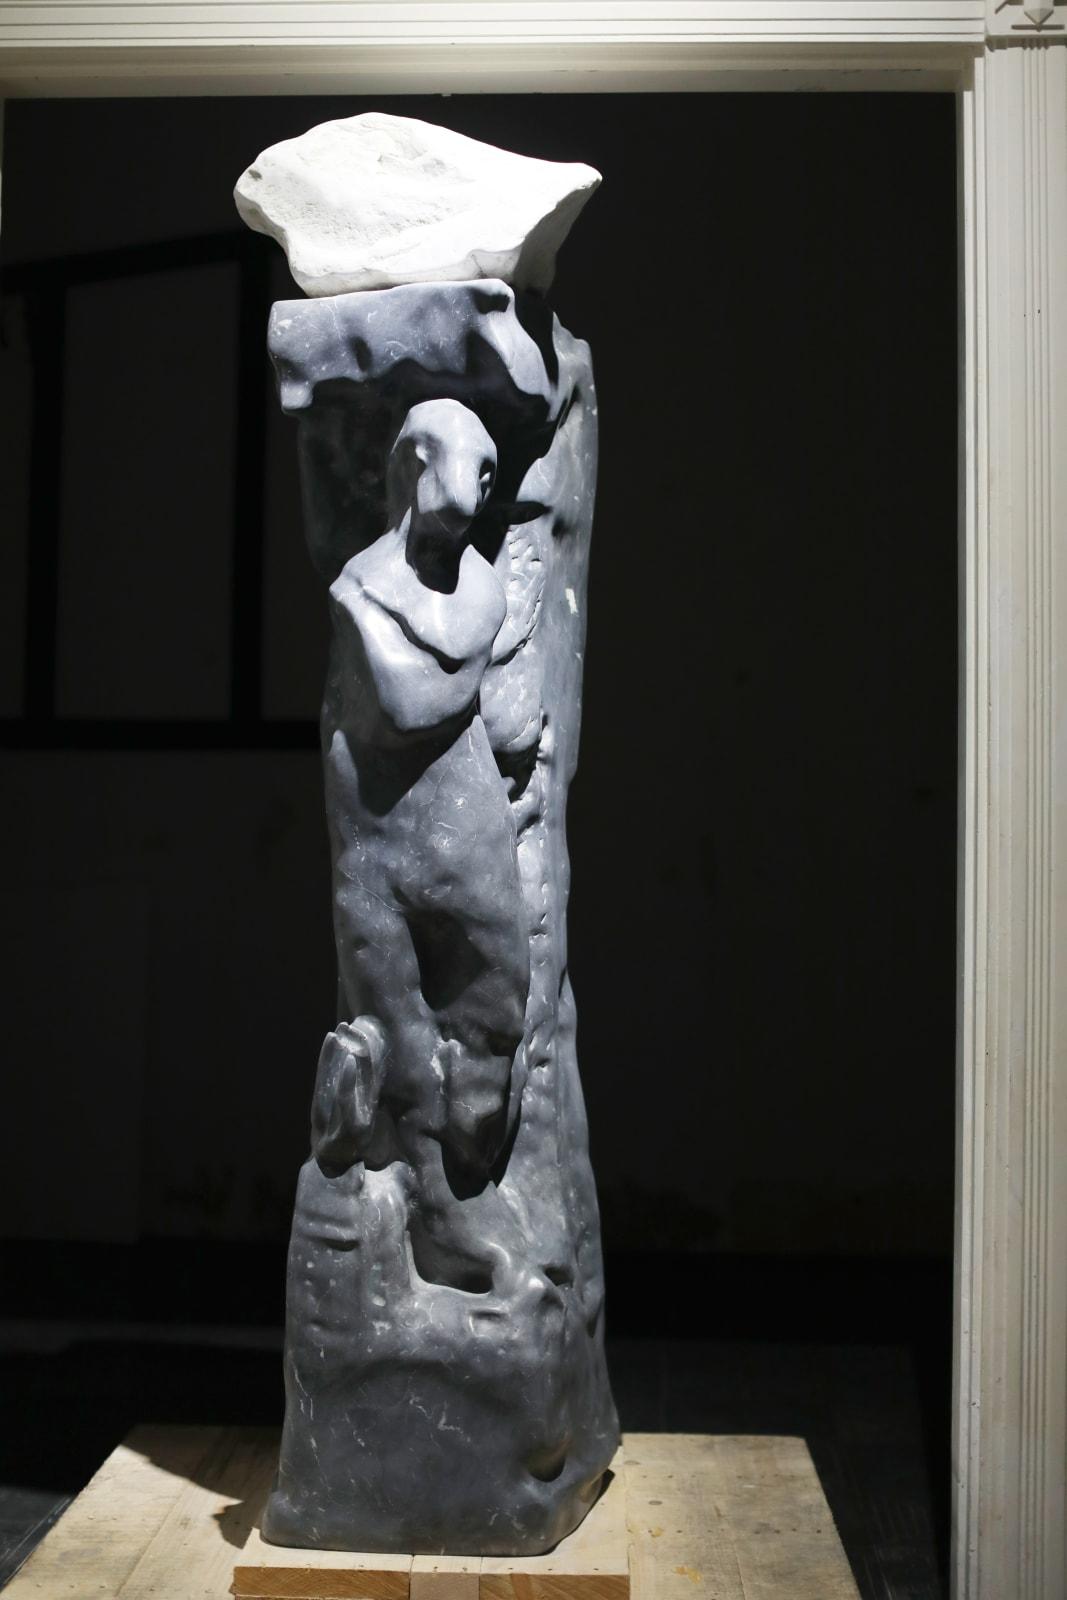 Chen Yujun, African Mythical Creature and Venus 非洲神兽与维纳斯 , 2018